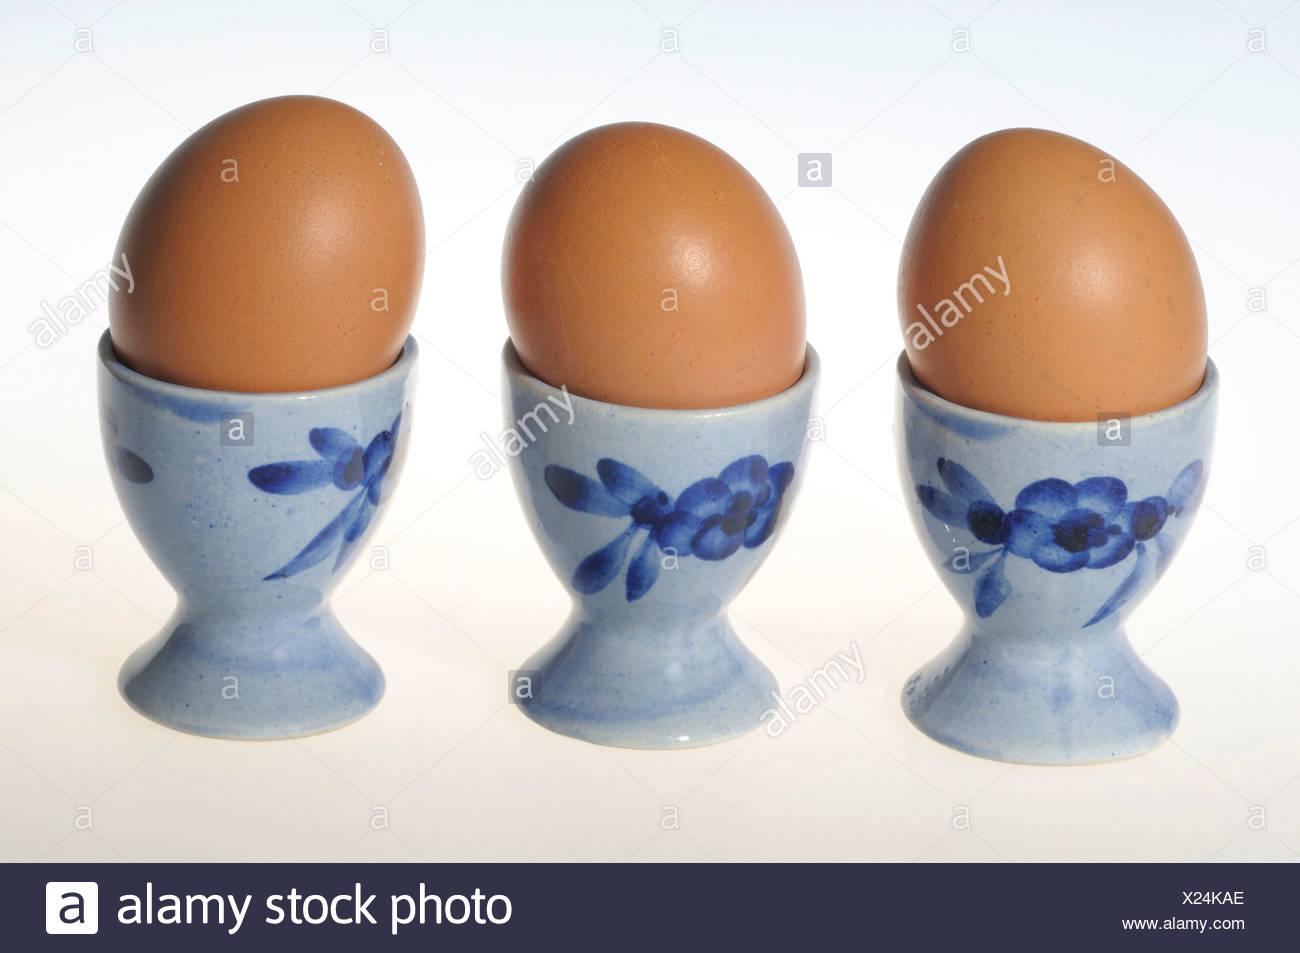 hen's eggs in egg cups - Stock Image